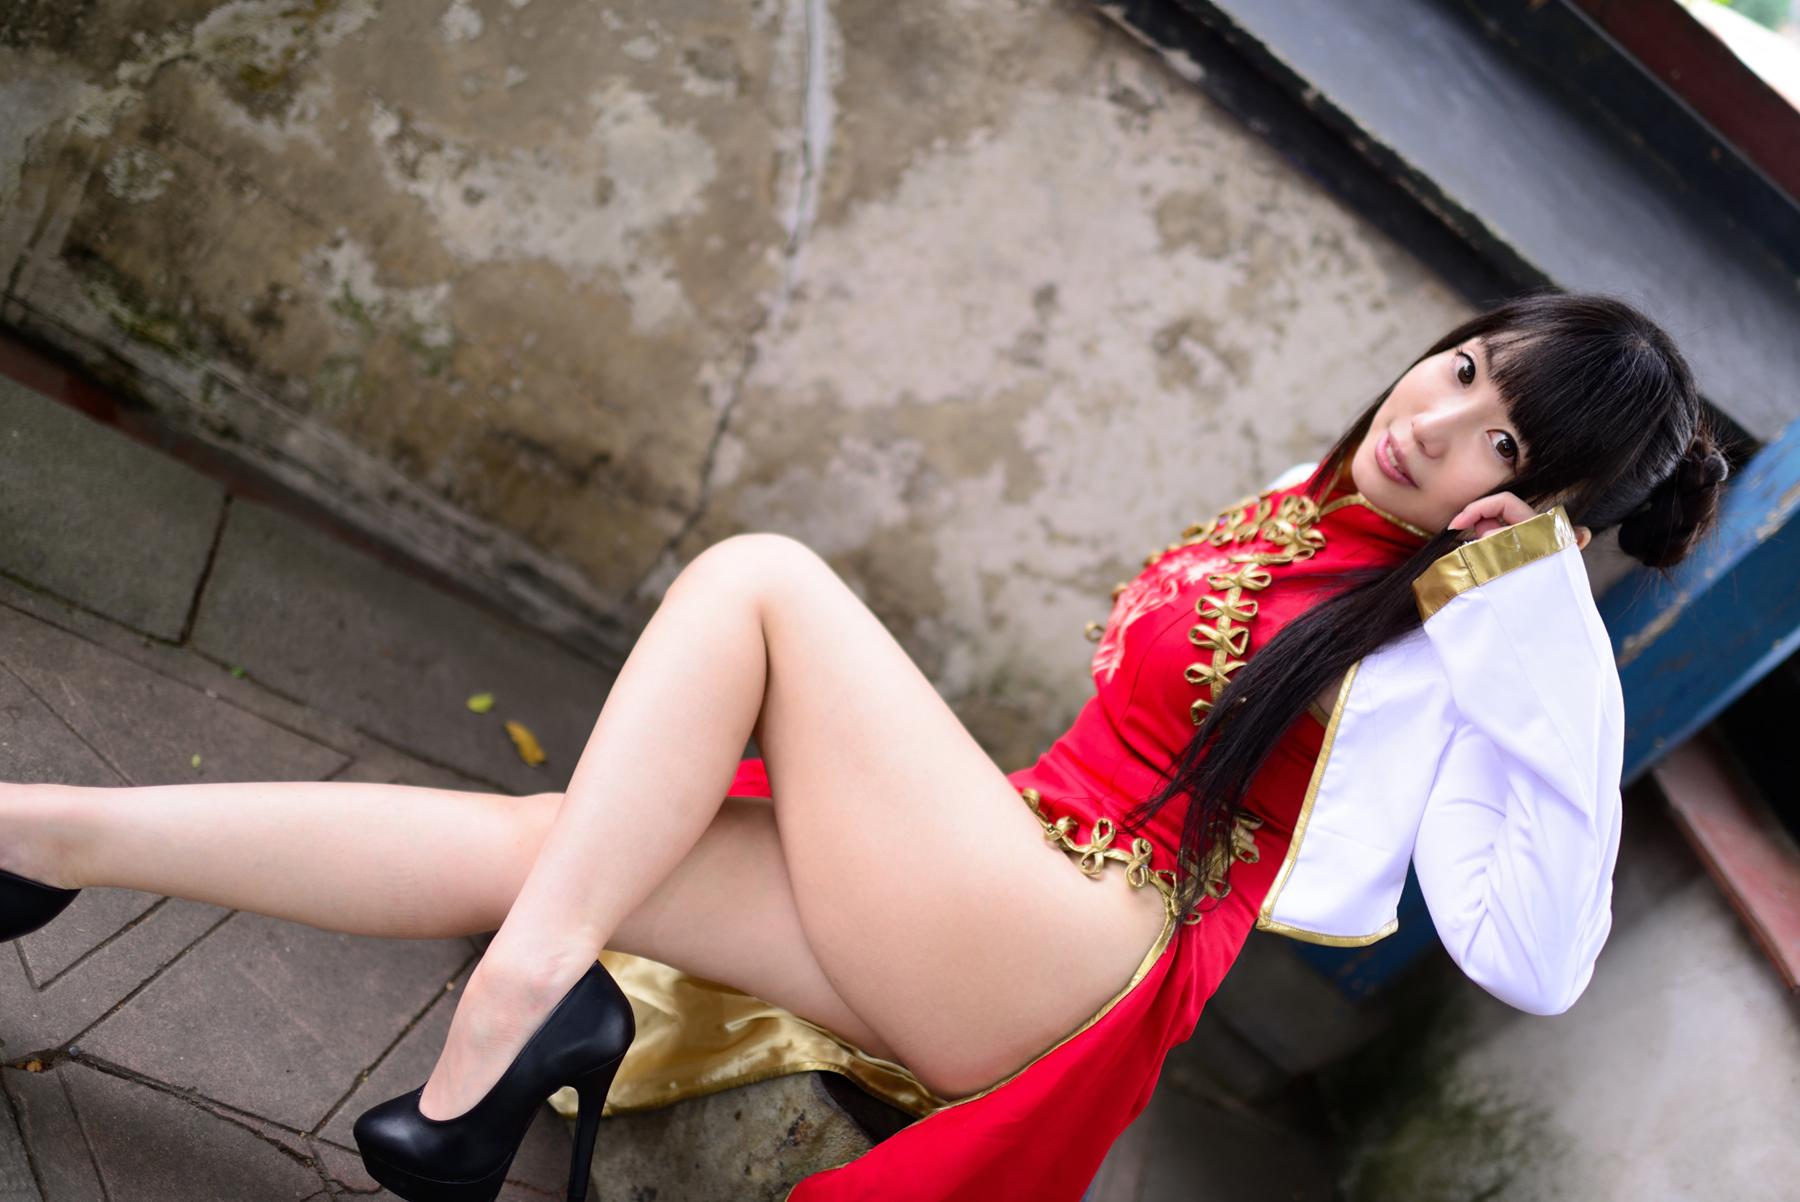 [Sugar*Myuku しゅがー*みゅく (Tenshi Myu 天使みゅ。)] Myutto China! みゅっとチャイナ! [471P629MB] dcs_1036-jpg